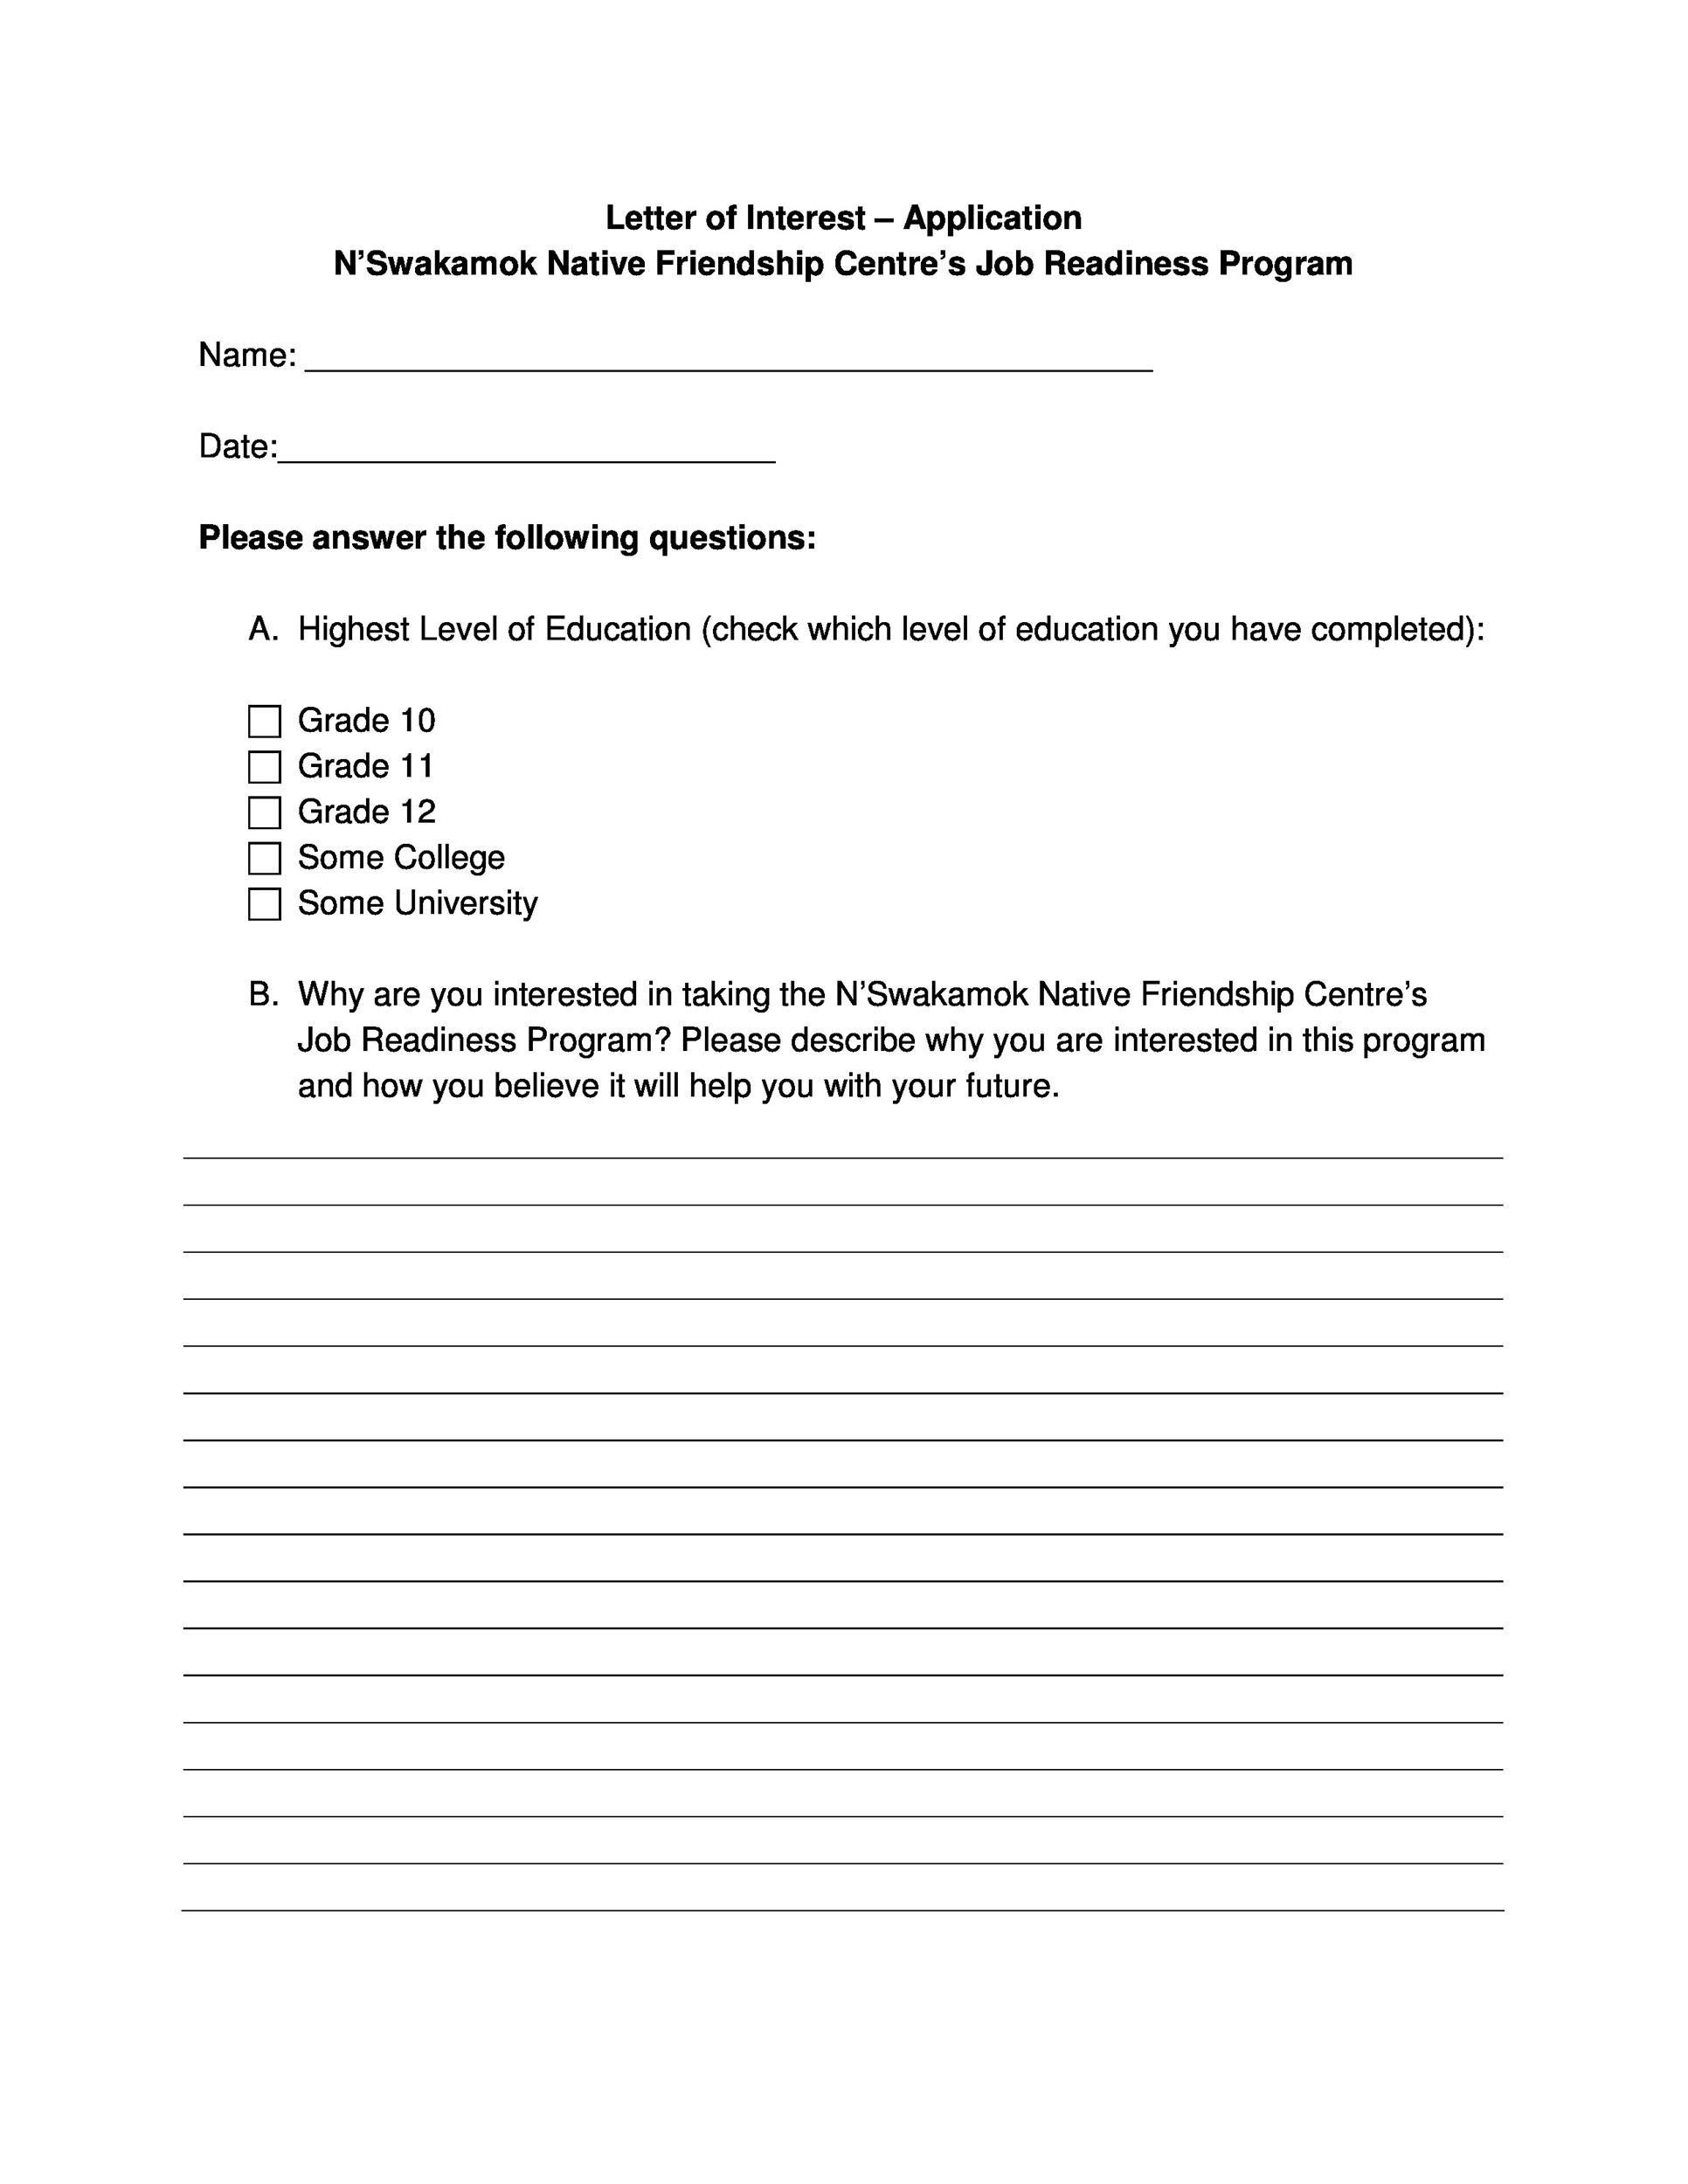 Free letter of interest 25